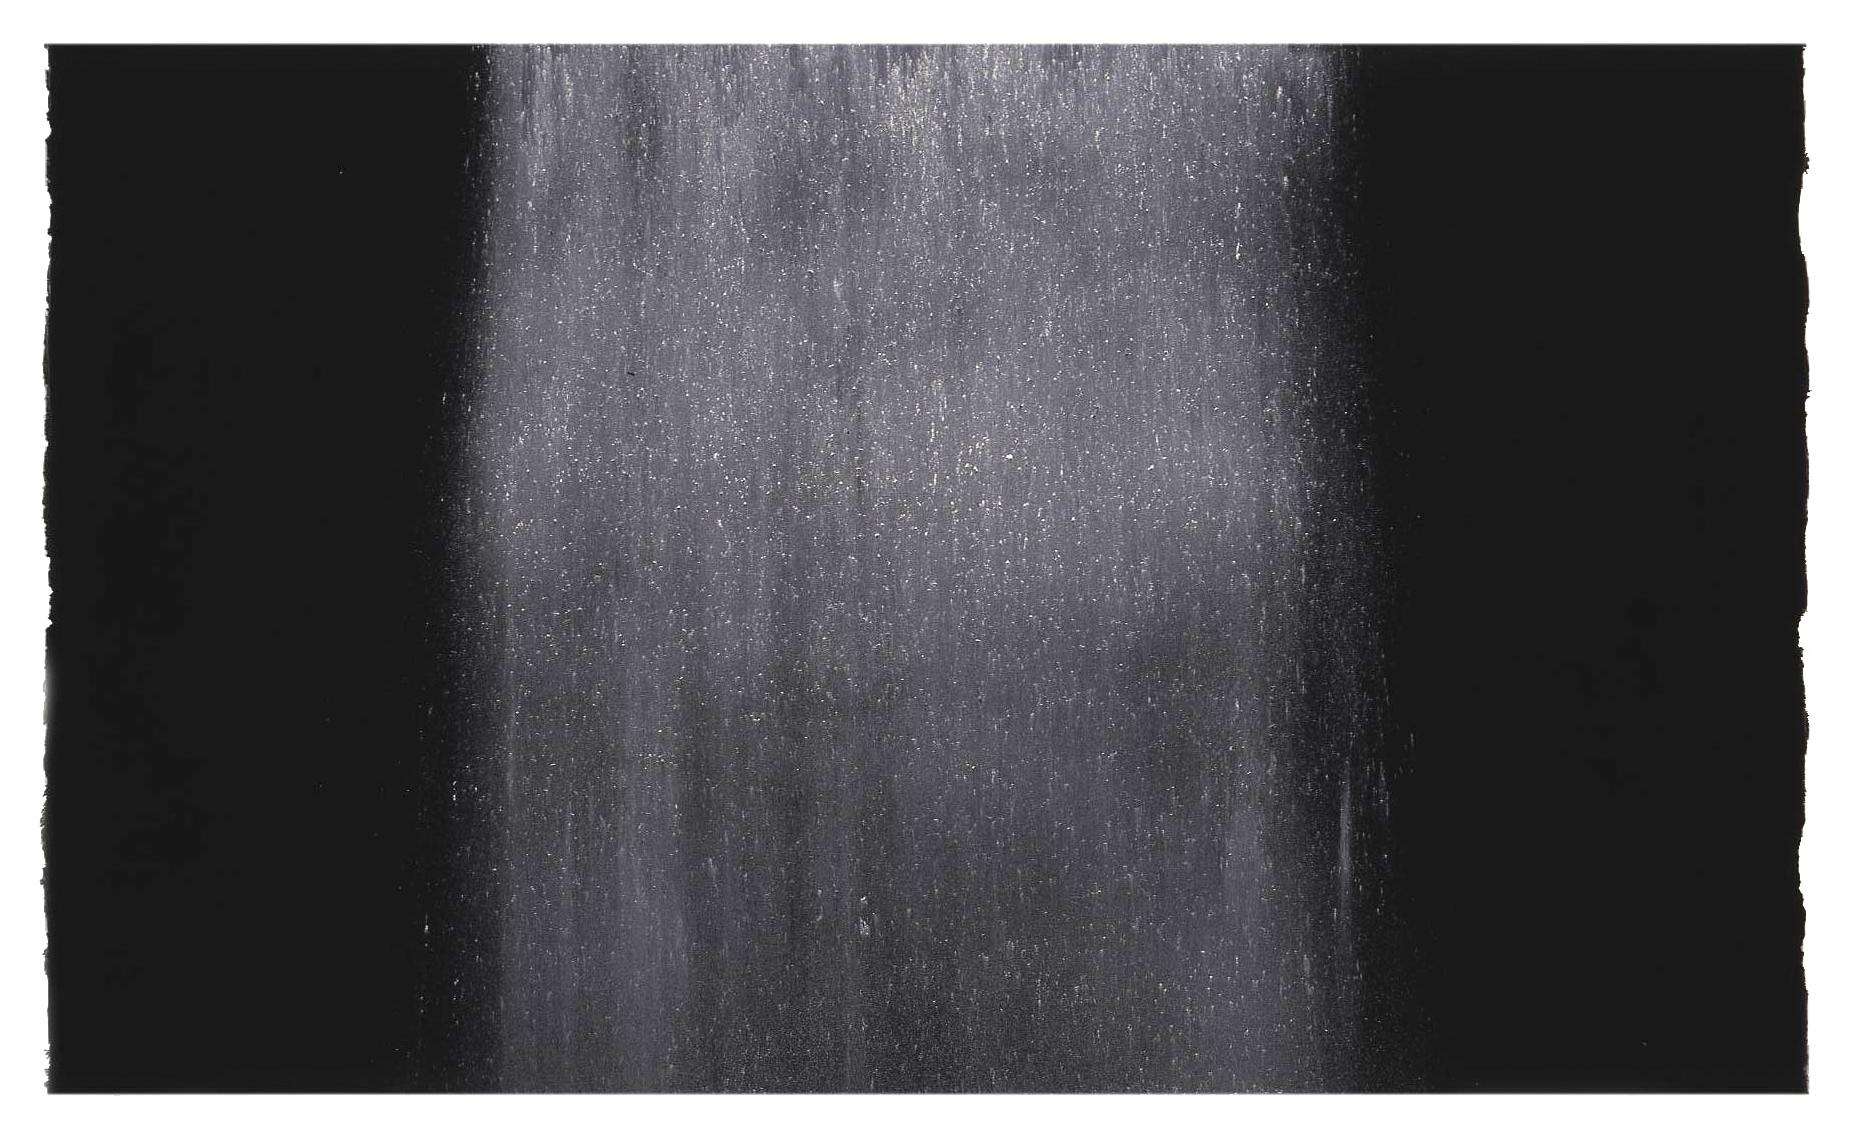 NOURISHING 1998  limestone powder on carbon deposit  77.0 x 55.7 cm   (private collection UK)